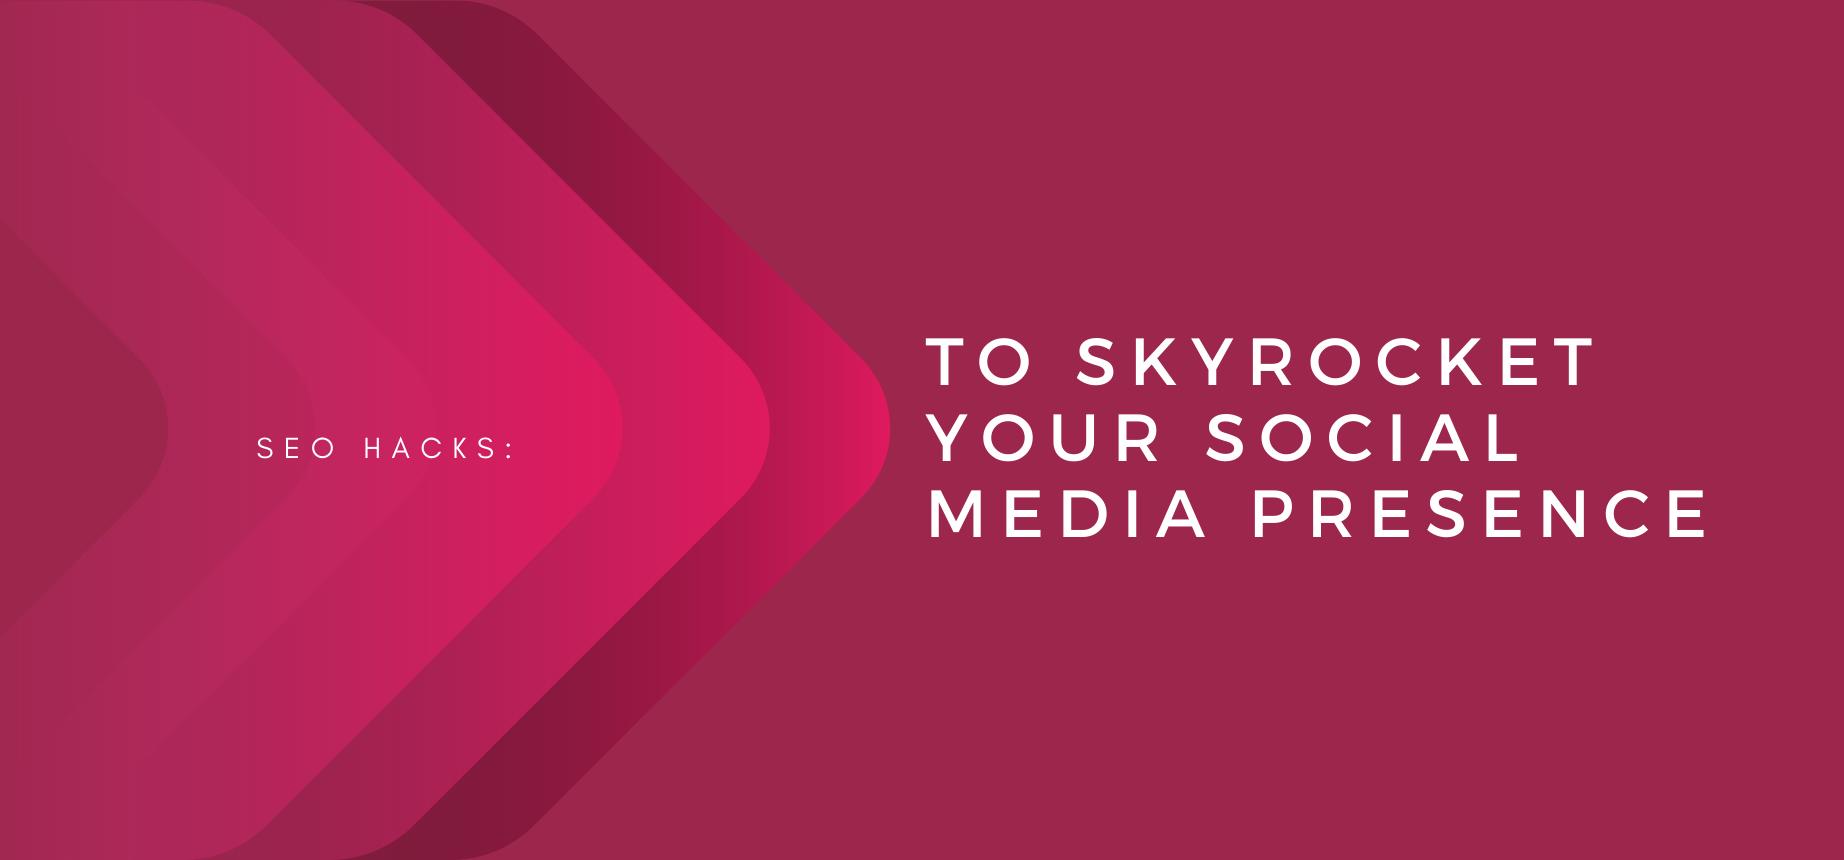 AgencyVista_Blog_seo-hacks-to-skyrocket-your-social-media-presence